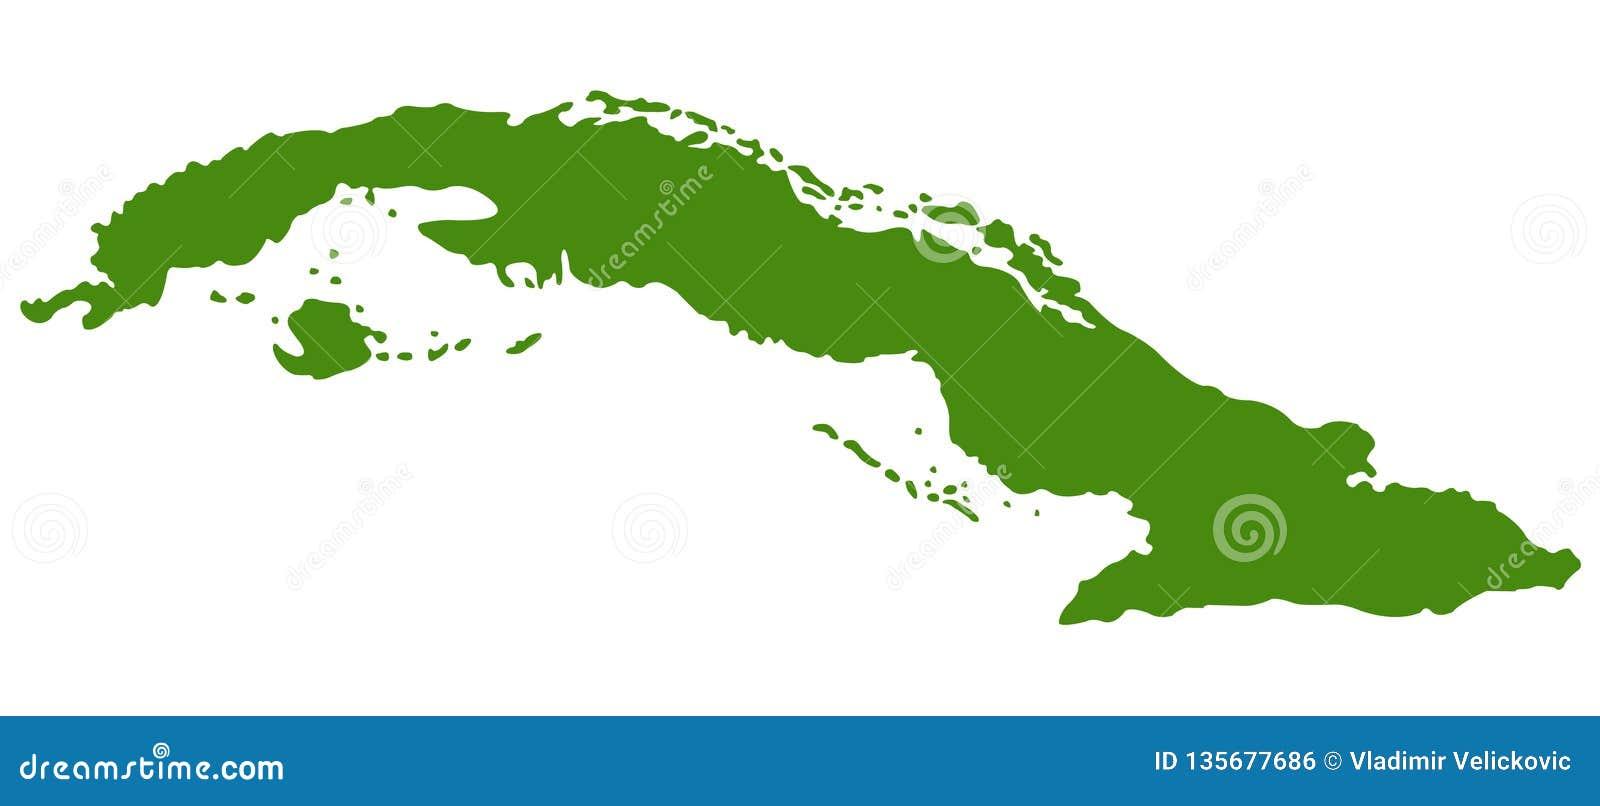 Carte Cuba Amerique.Carte Du Cuba Republique De Cuba Illustration De Vecteur